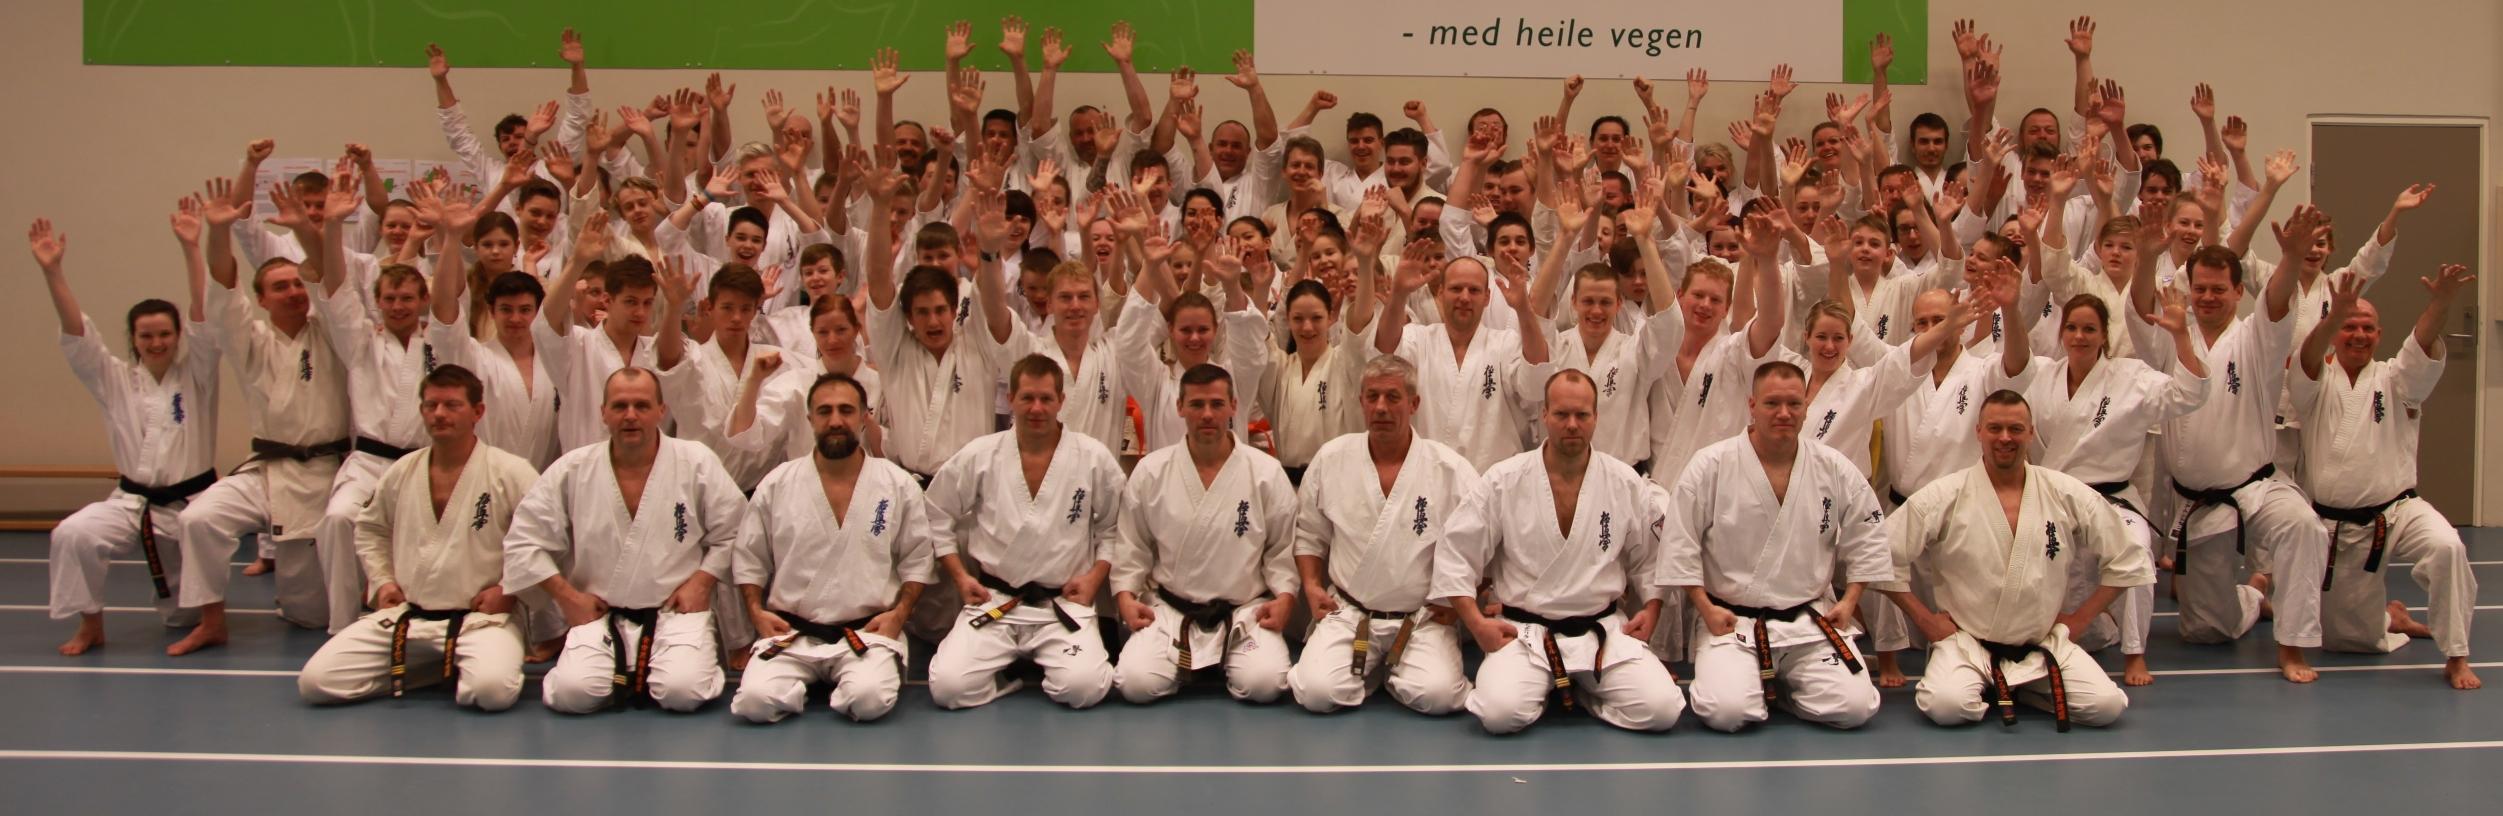 Seminario karate kyokushin noruega 2016 gimnasio yin yang for Gimnasio yin yang